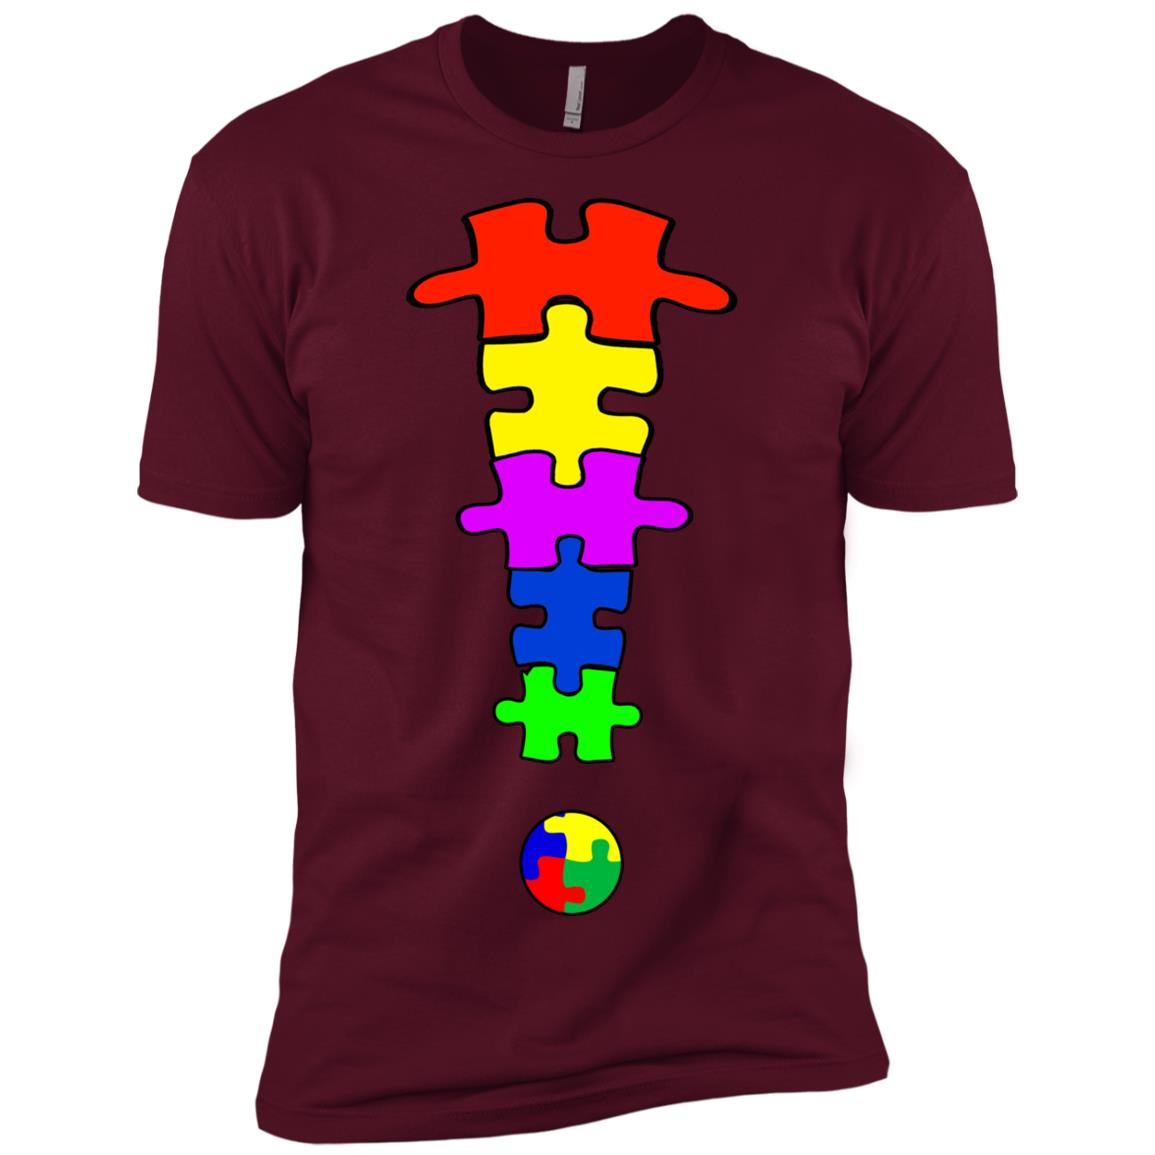 Autism Puzzle – Autism Awarenesss Men Short Sleeve T-Shirt